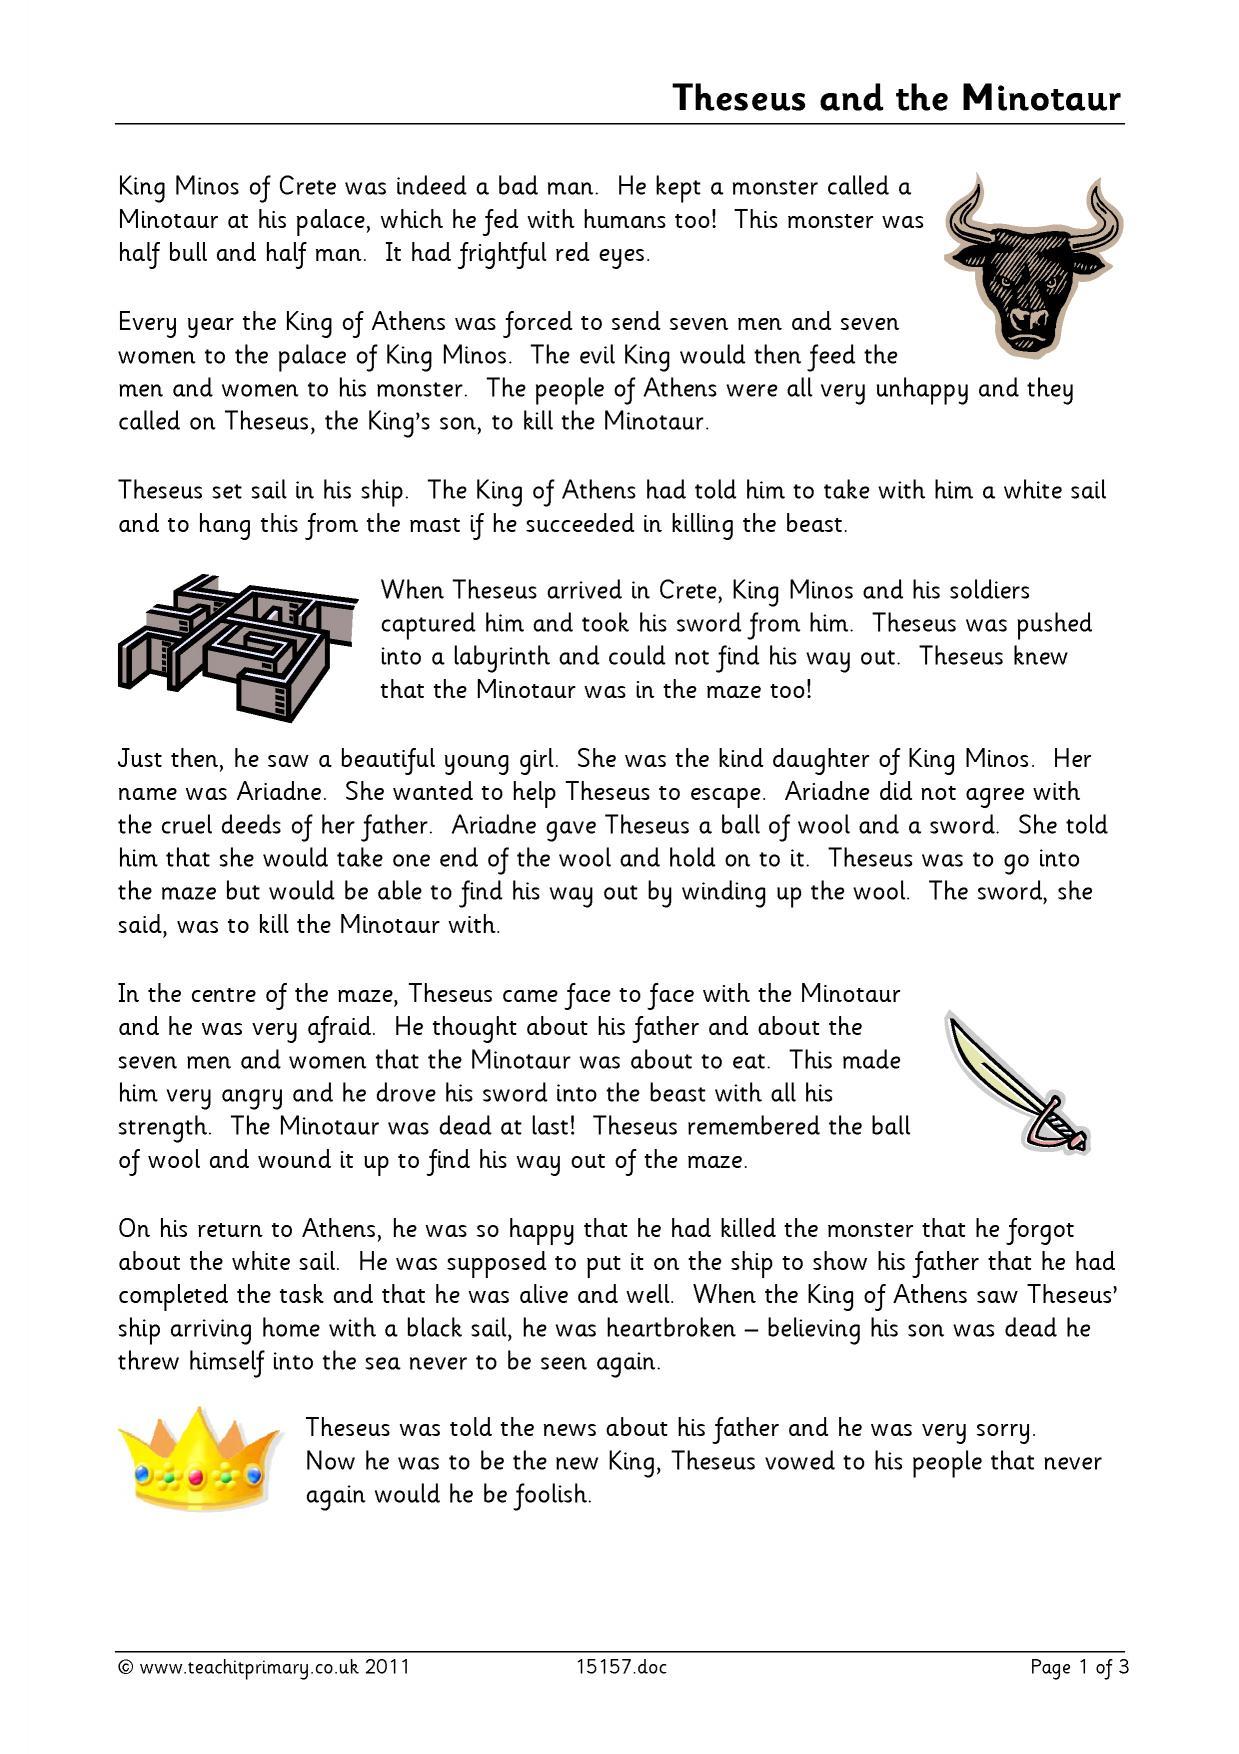 Theseus And The Minotaur Hero Or Villian